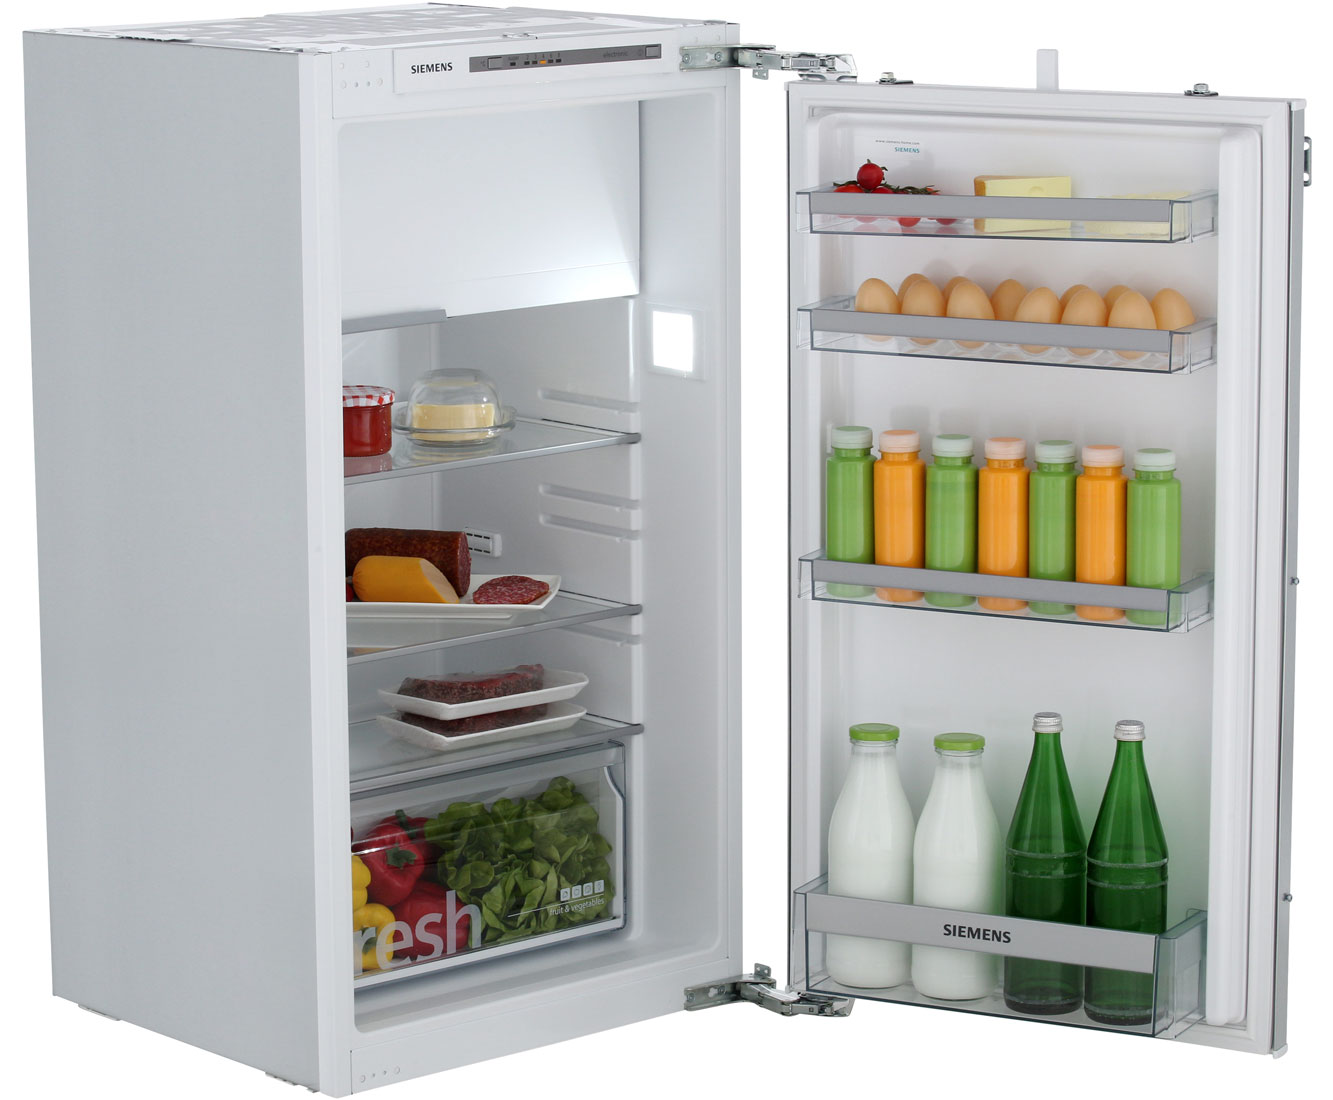 Siemens Studioline Kühlschrank : Siemens einbaukühlschrank ohne gefrierfach einbaukühlschrank